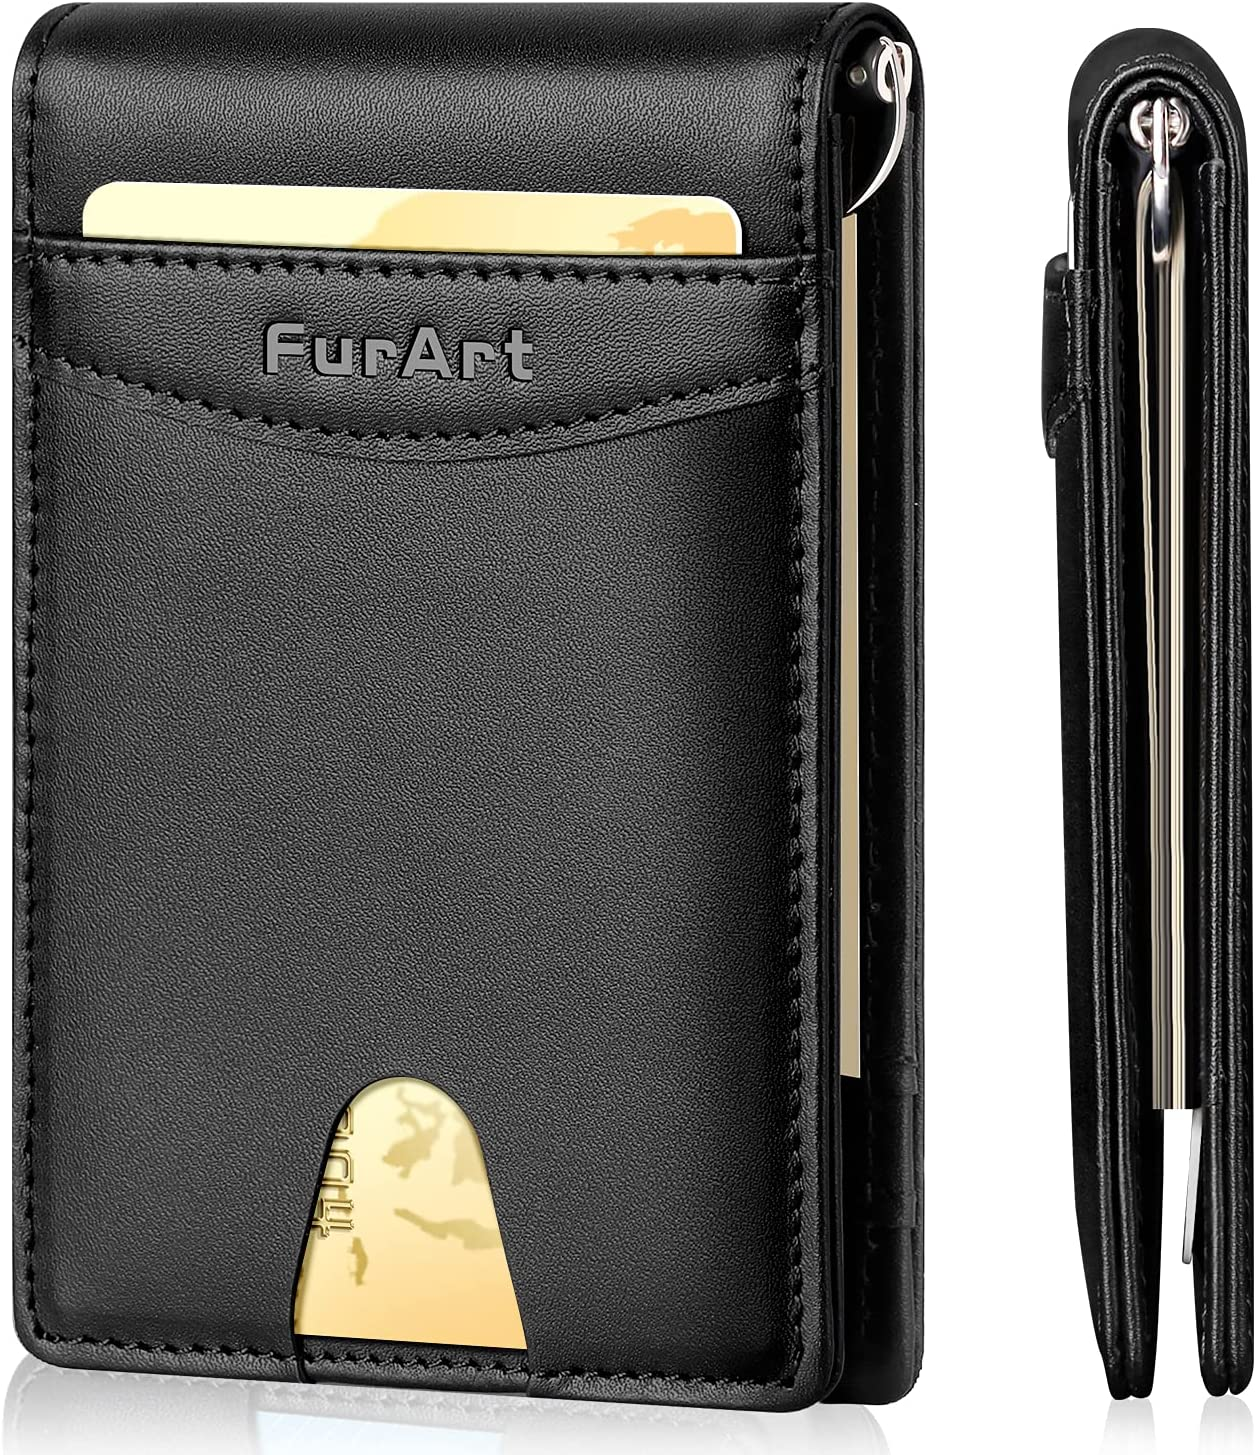 FurArt Leather Mens Bifold Wallet with Money Clip RFID Blocking Slim Front Pocket Wallets for Men